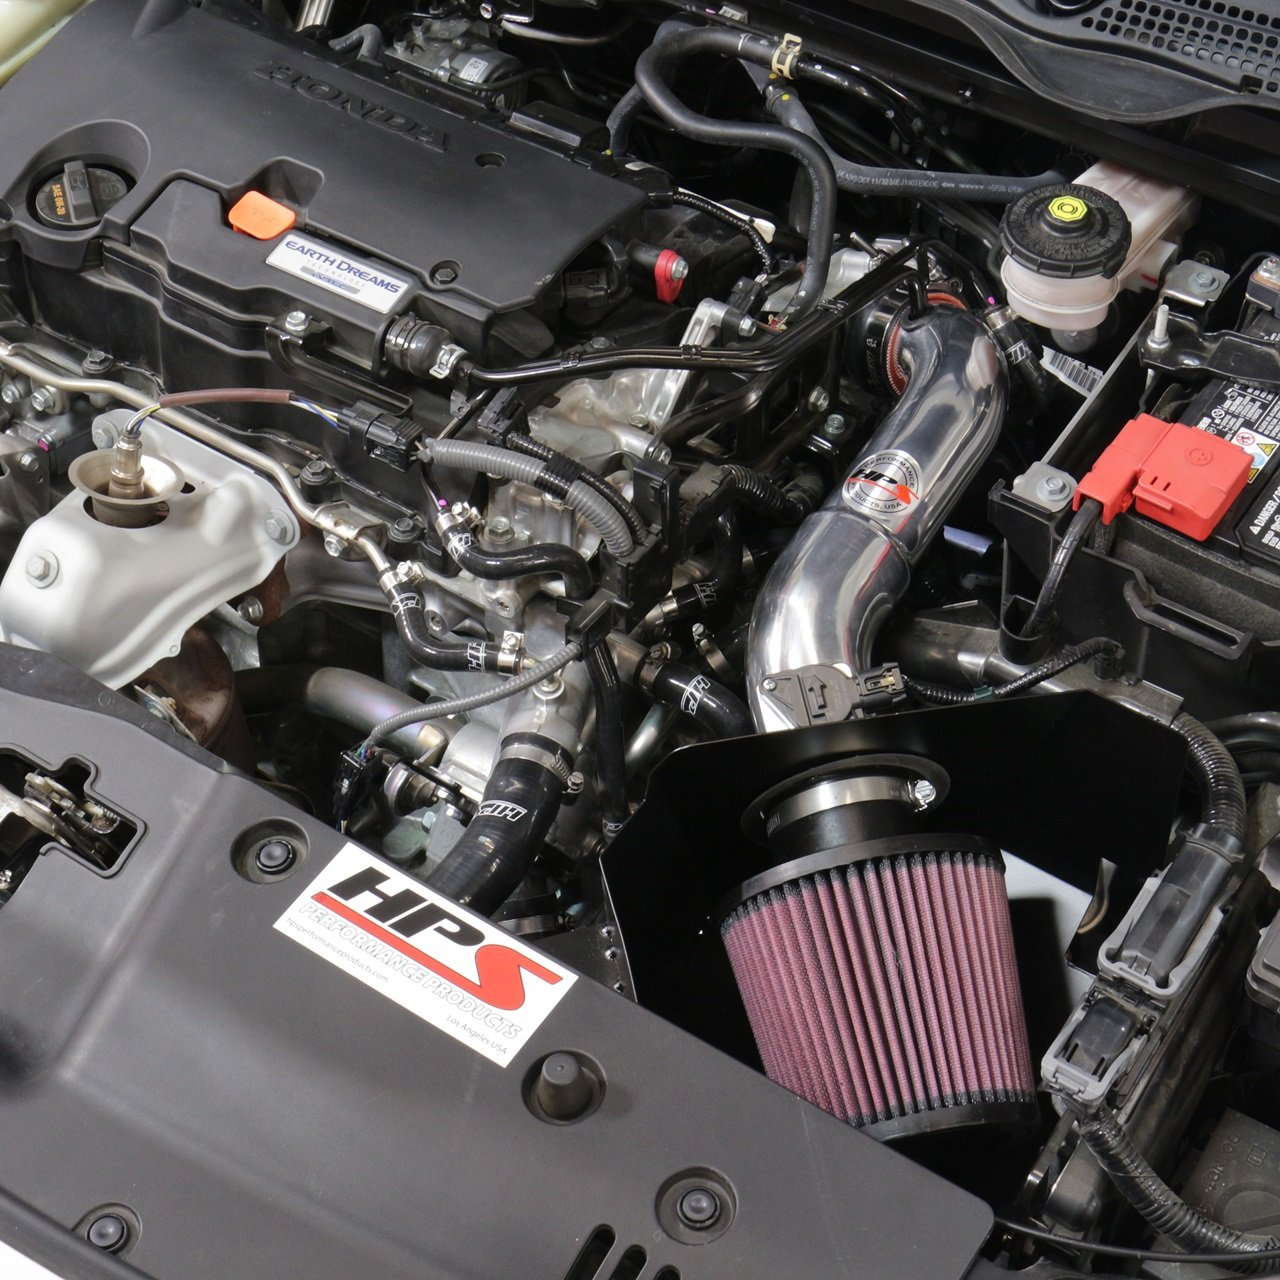 Amazon.com: HPS Blue Shortram Air Intake Kit + Heat Shield for 2016 2017 Honda Civic 2.0L Non Turbo 10th Gen: Automotive